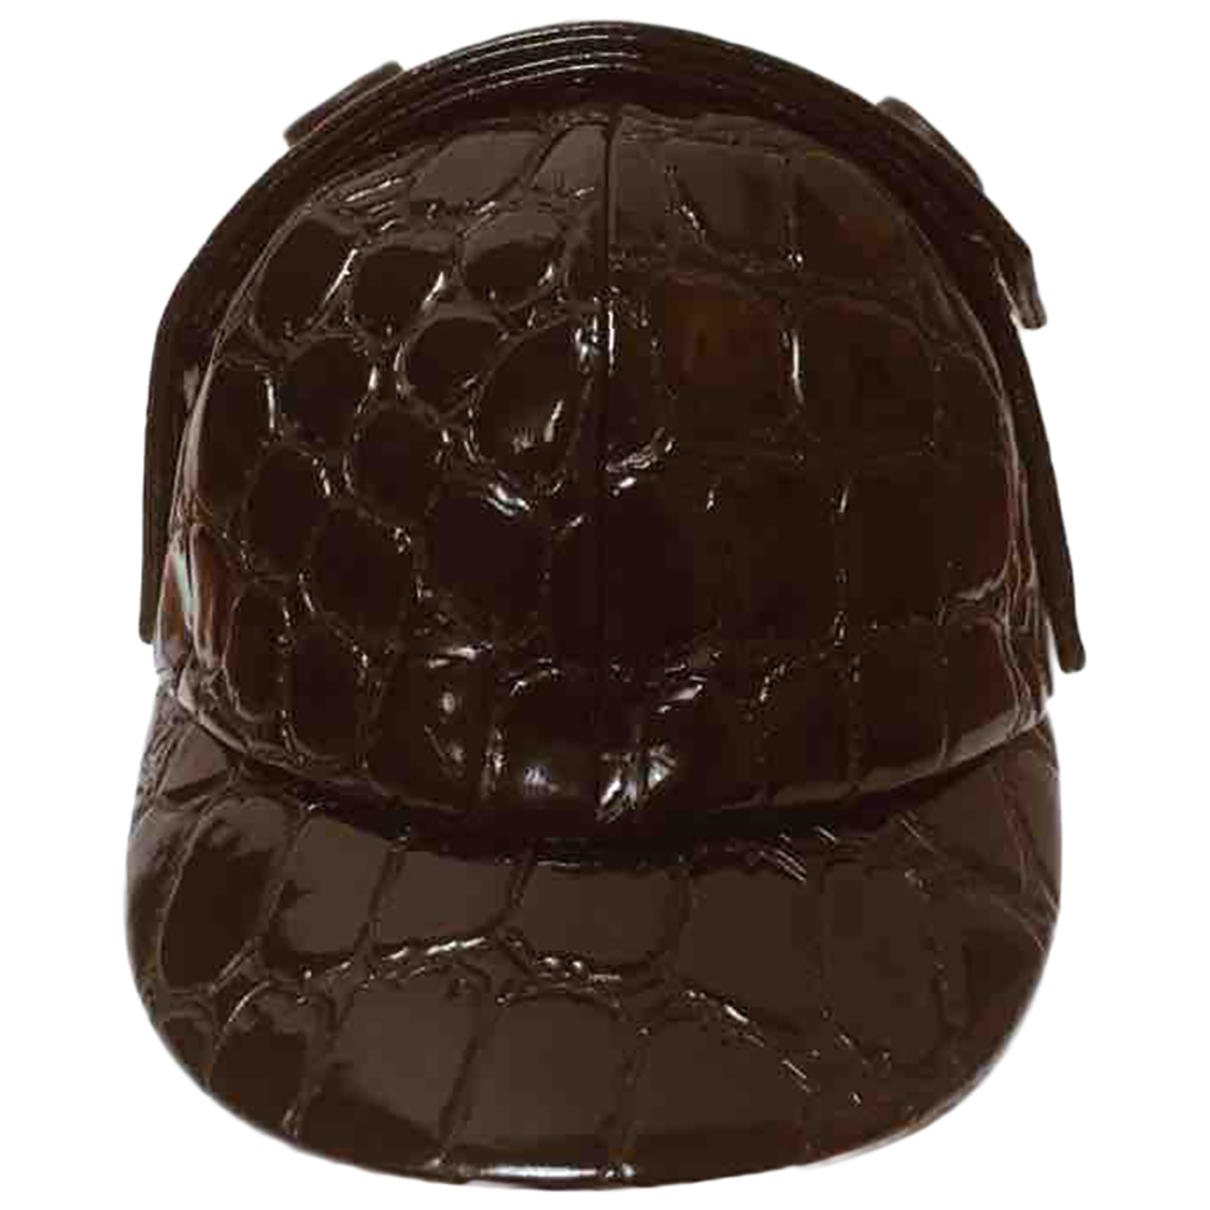 Miu Miu N Brown Leather hat for Women M International